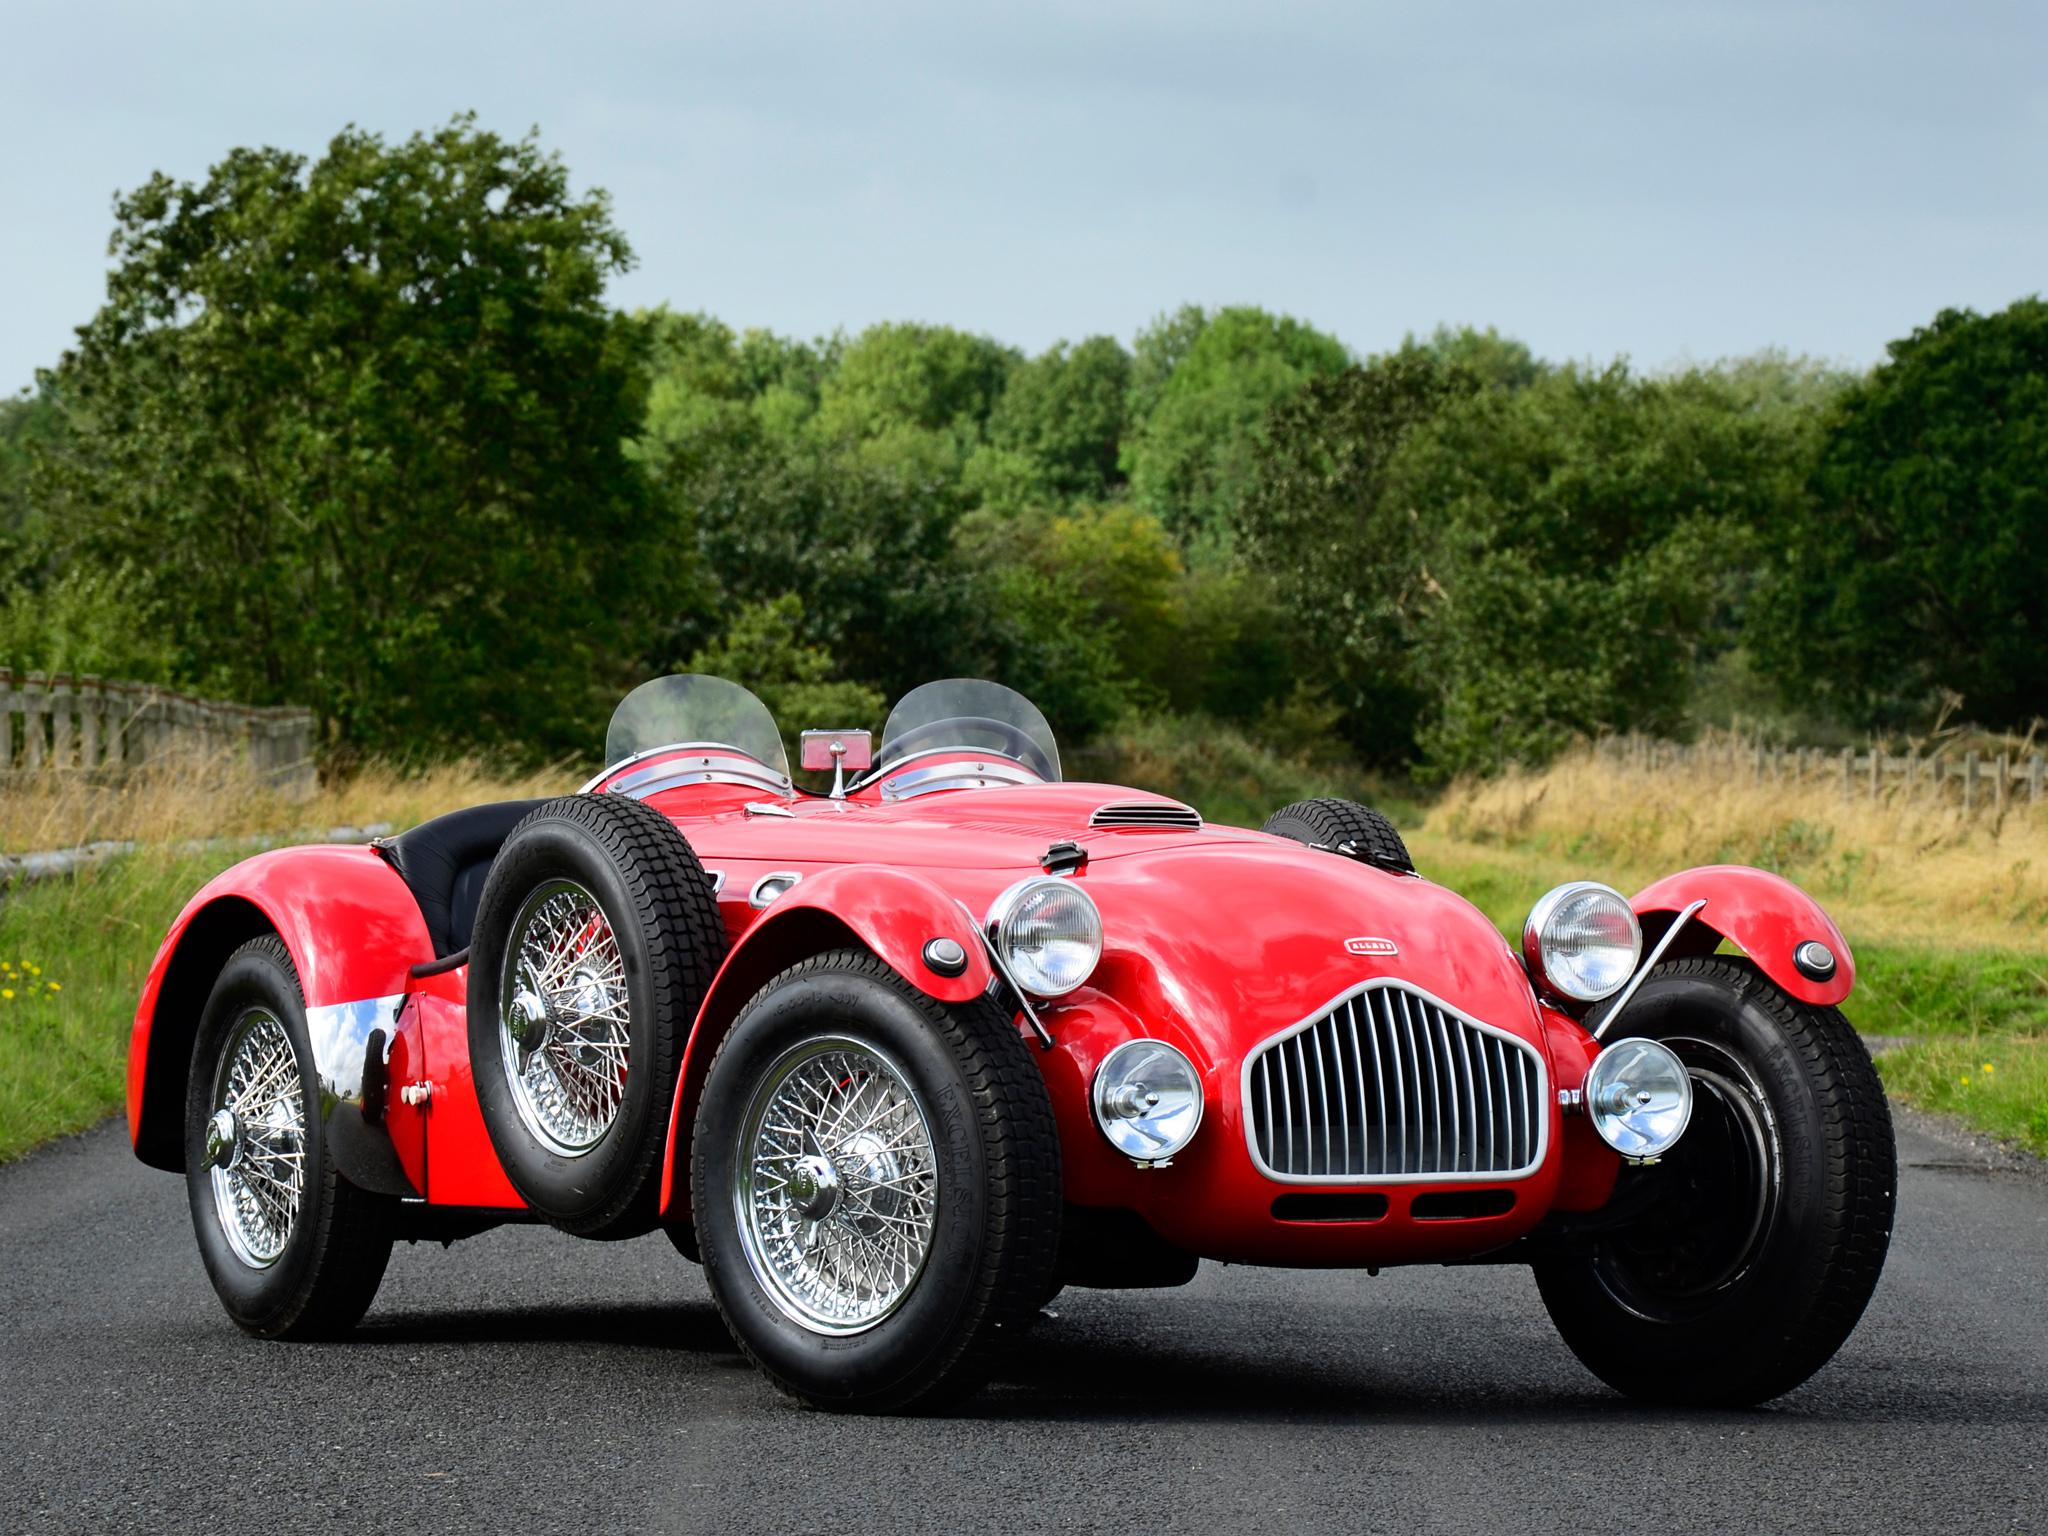 Race Car Images >> 1950 Allard J-2 Roadster supercar race racing retro s wallpaper   2048x1536   134799   WallpaperUP